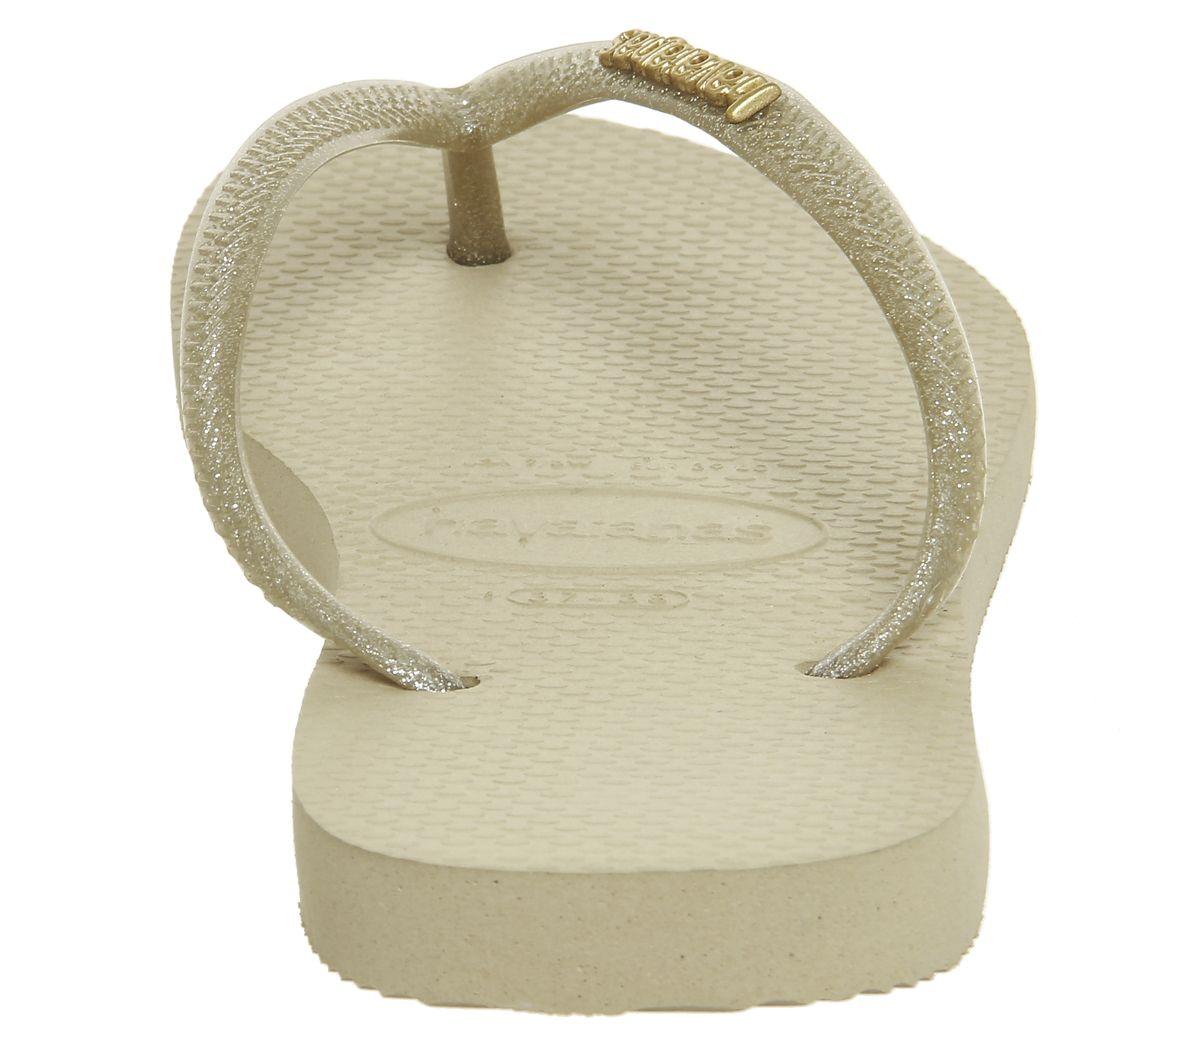 217b4356f34d Havaianas Slim Logo Metallic Flip Flops Light Gold - Sandals